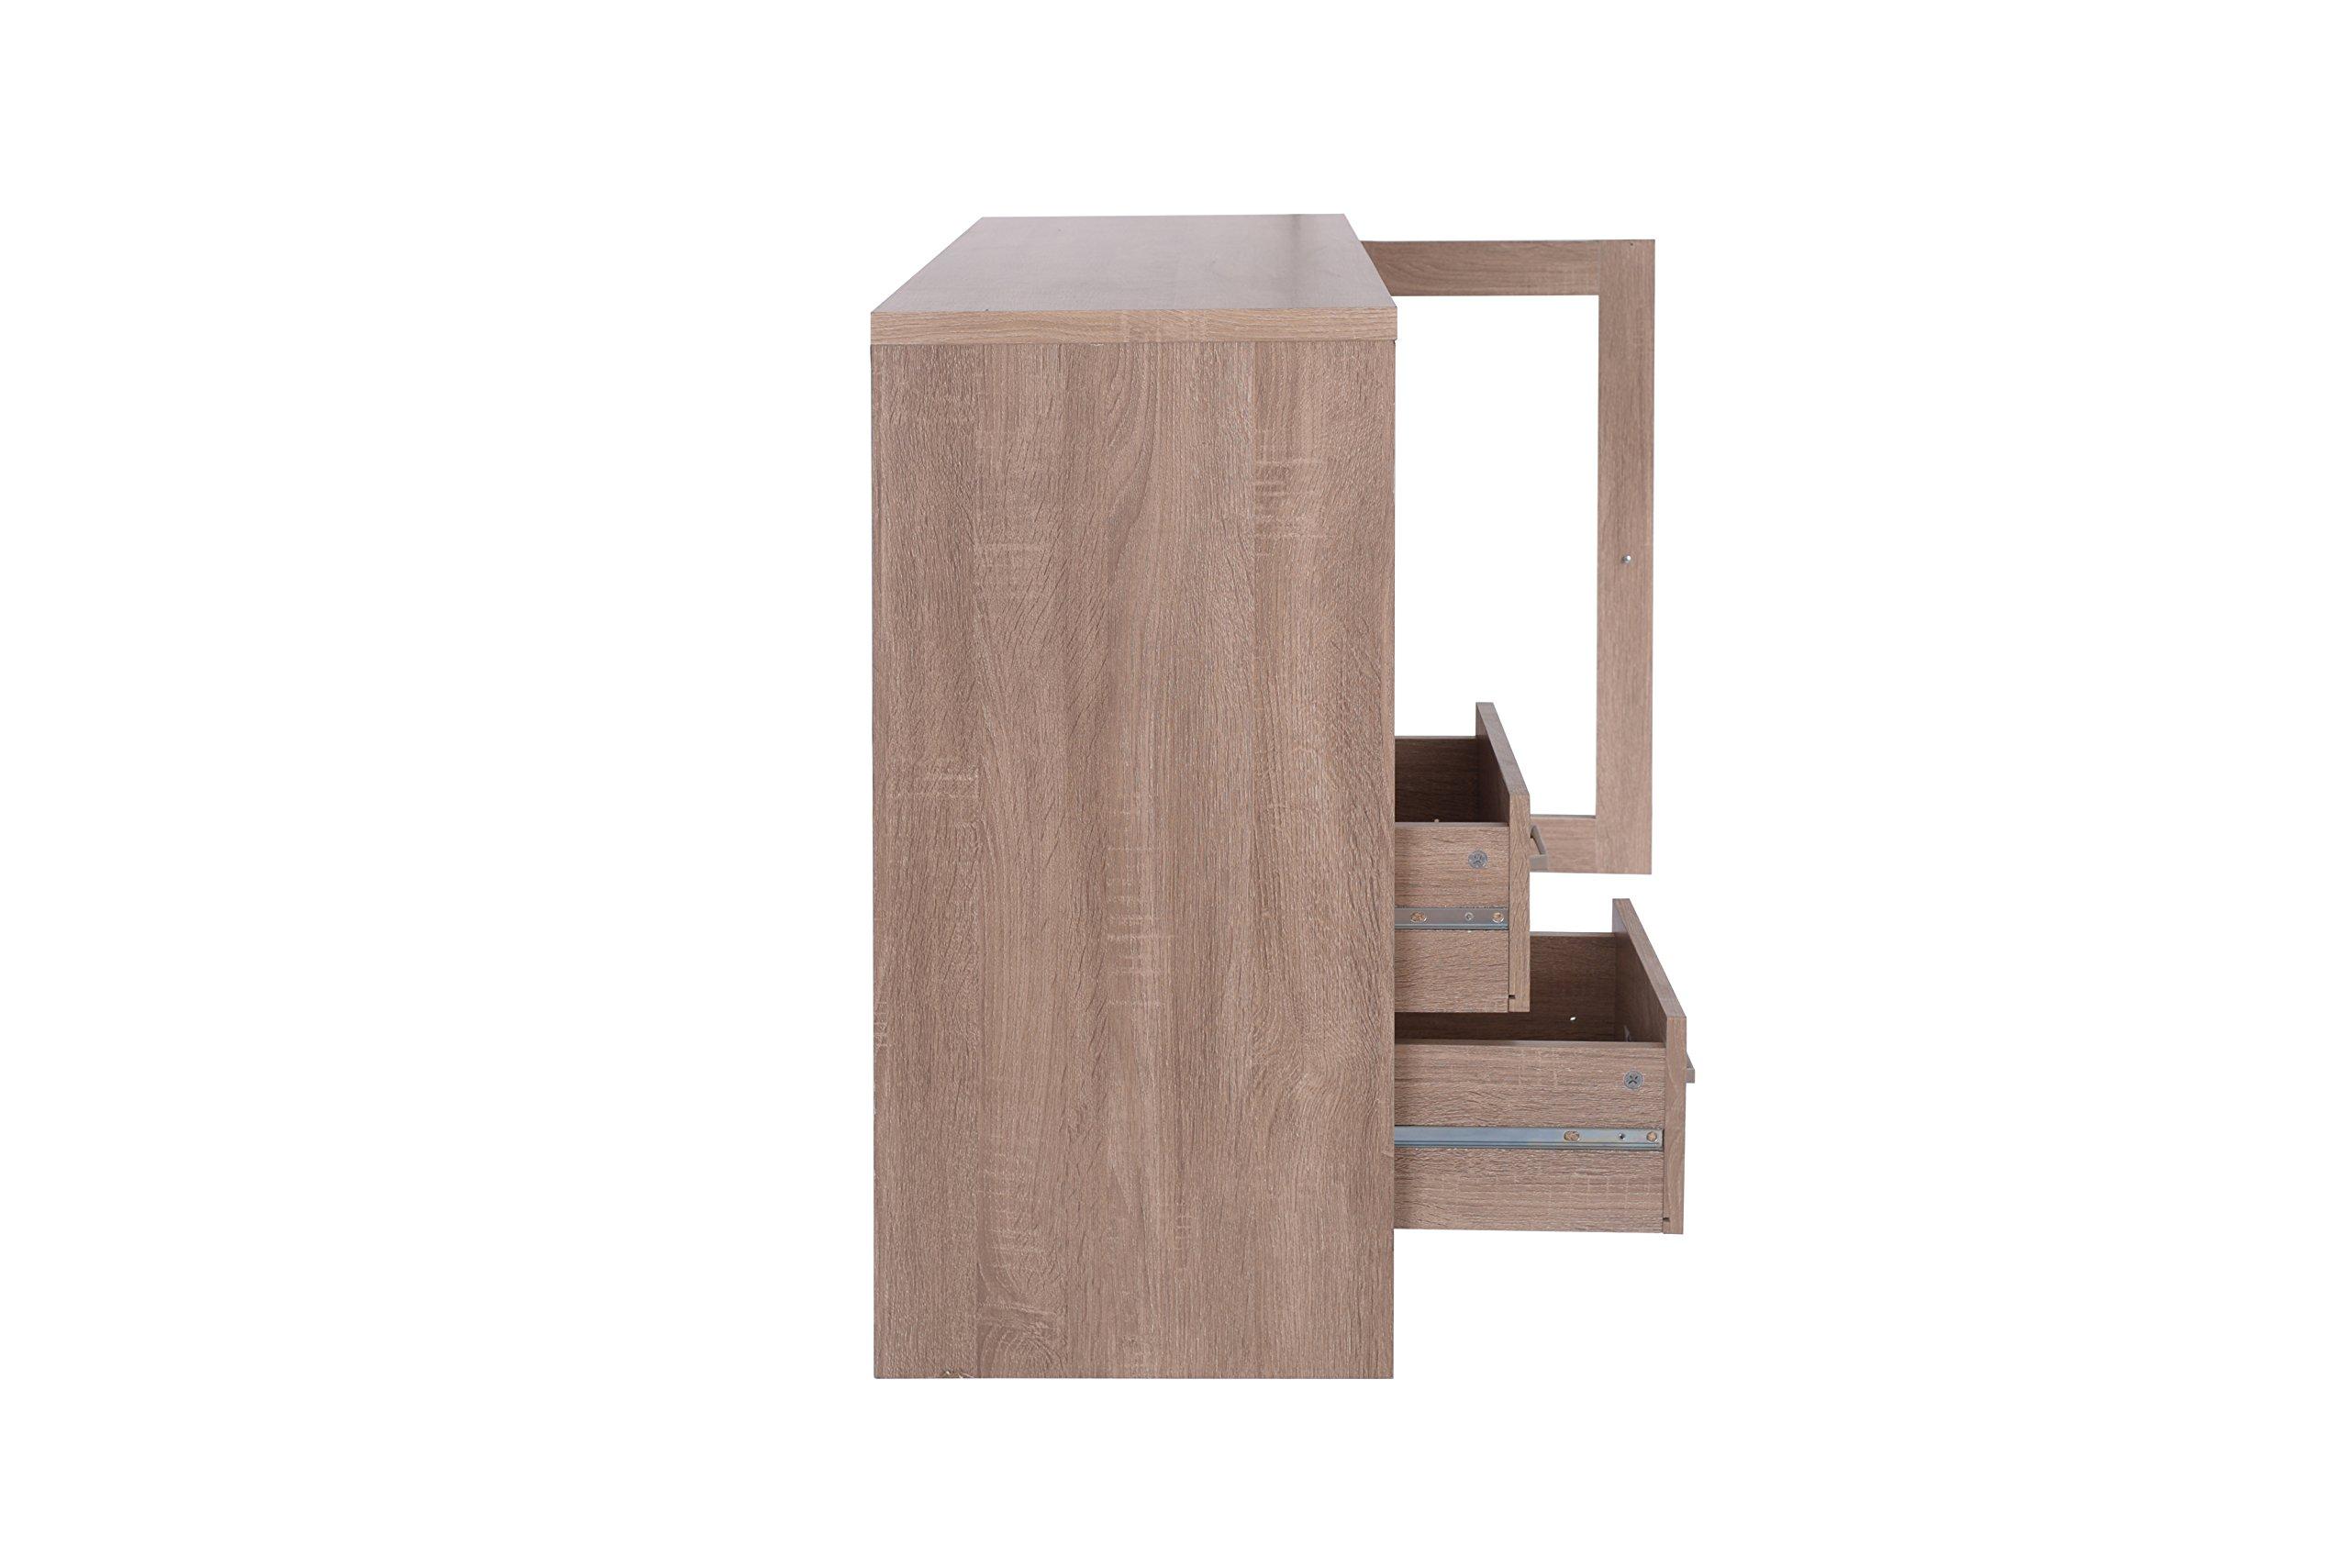 Acme Furniture 72635 Joice Rustic Oak Server by Acme Furniture (Image #4)